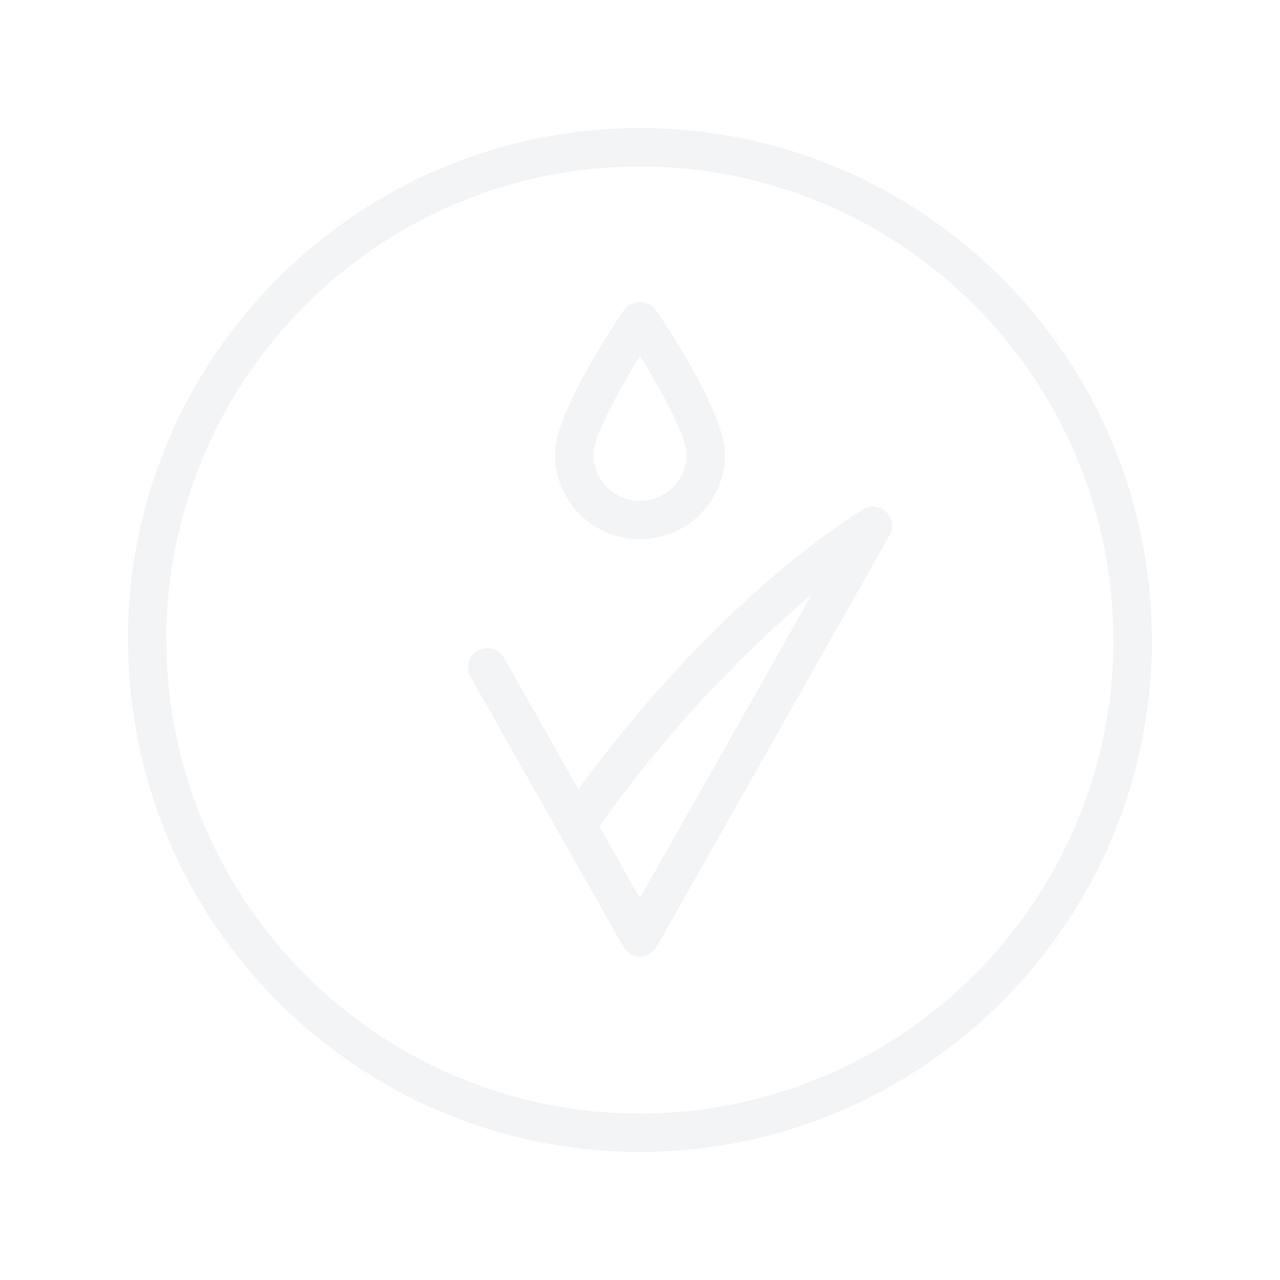 Decleor Harmonie Calm Soothing Milky Cream (Sensitive Skin) 50ml